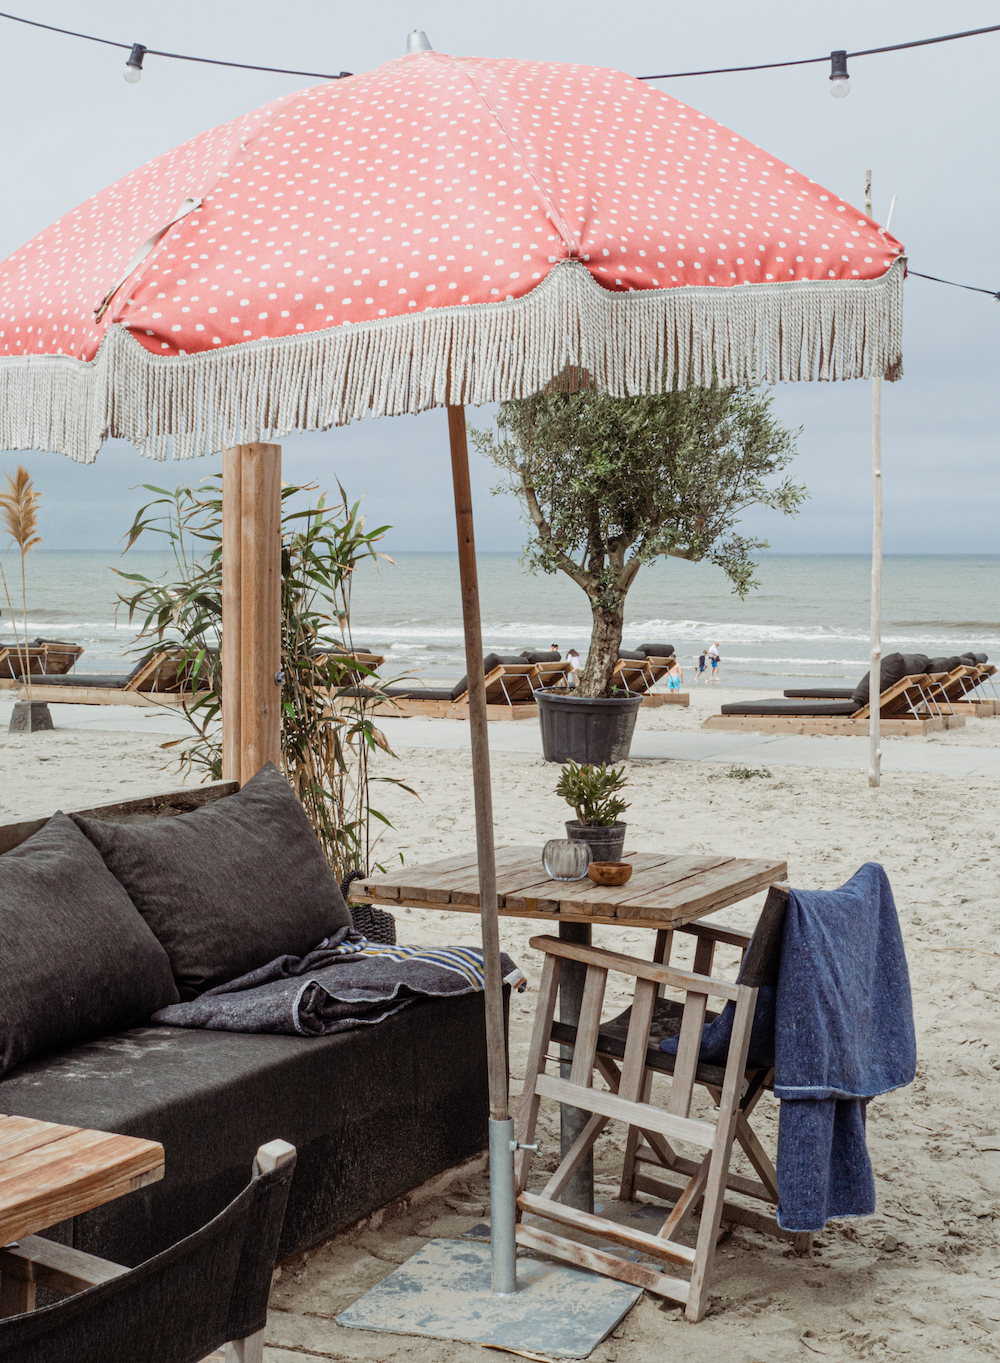 Wat te doen in Haarlem, strandtent